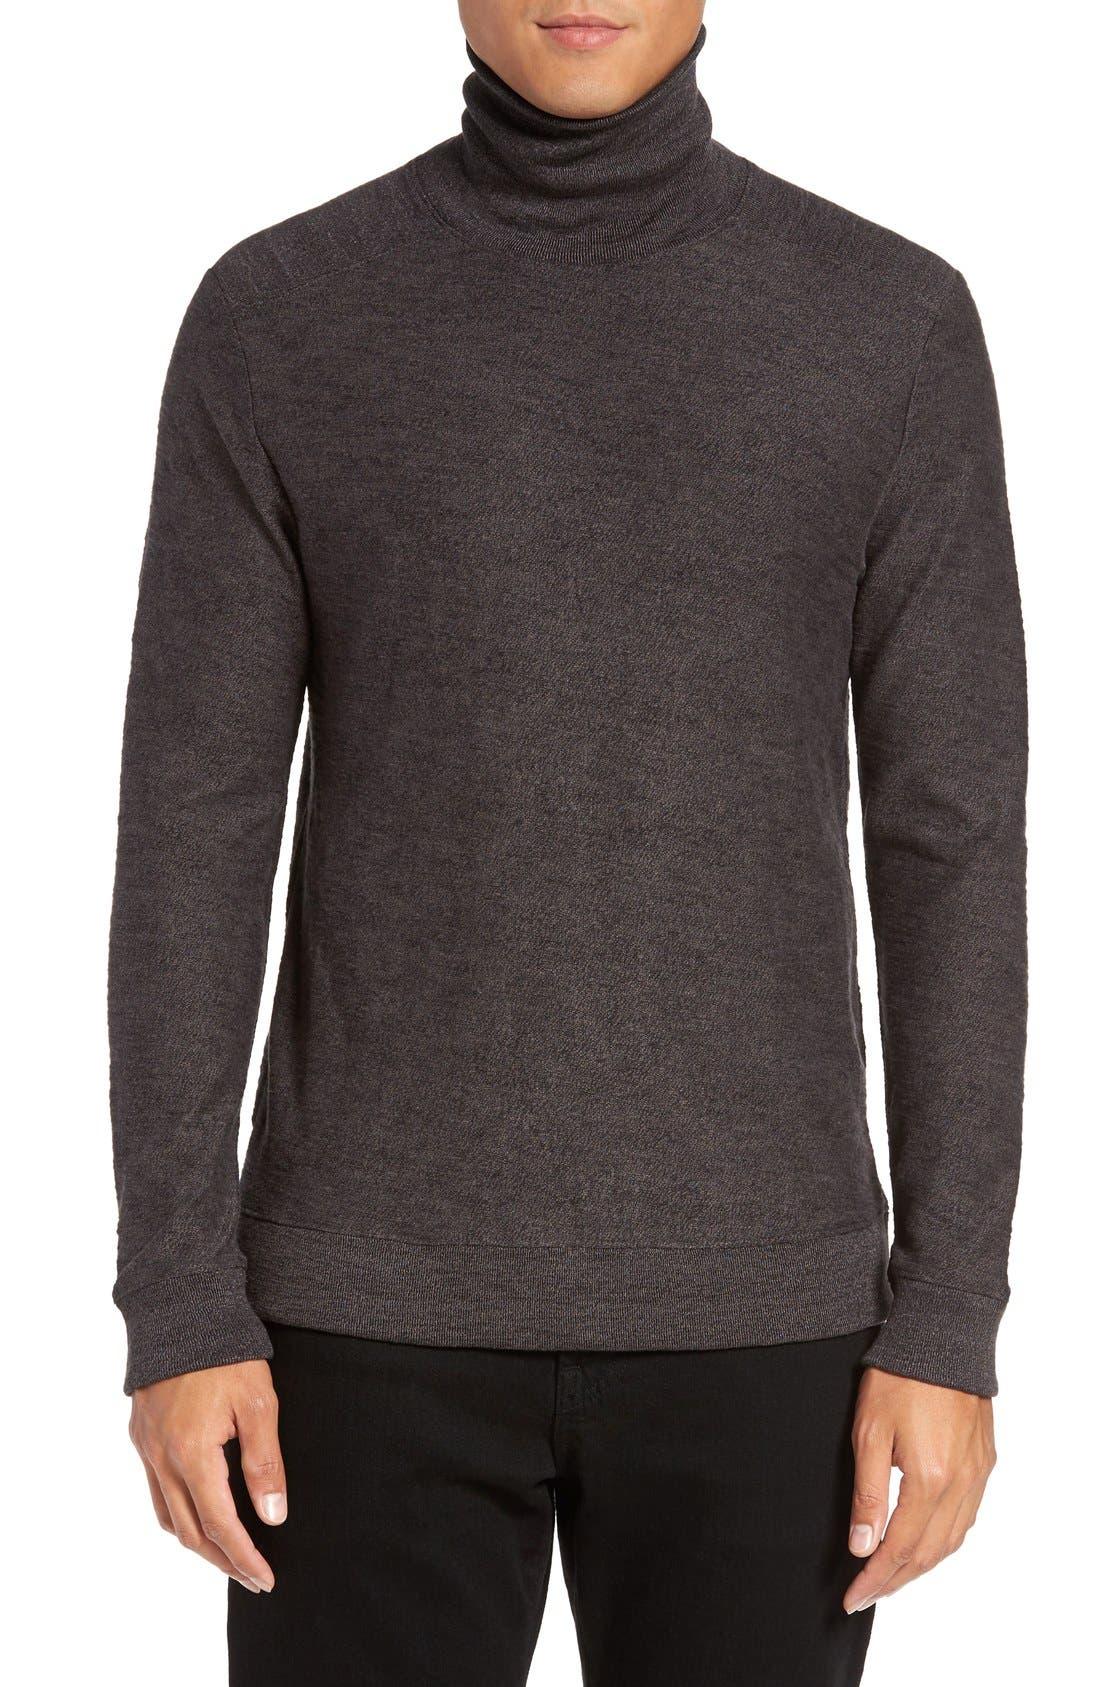 Turtleneck Sweater,                             Main thumbnail 1, color,                             034